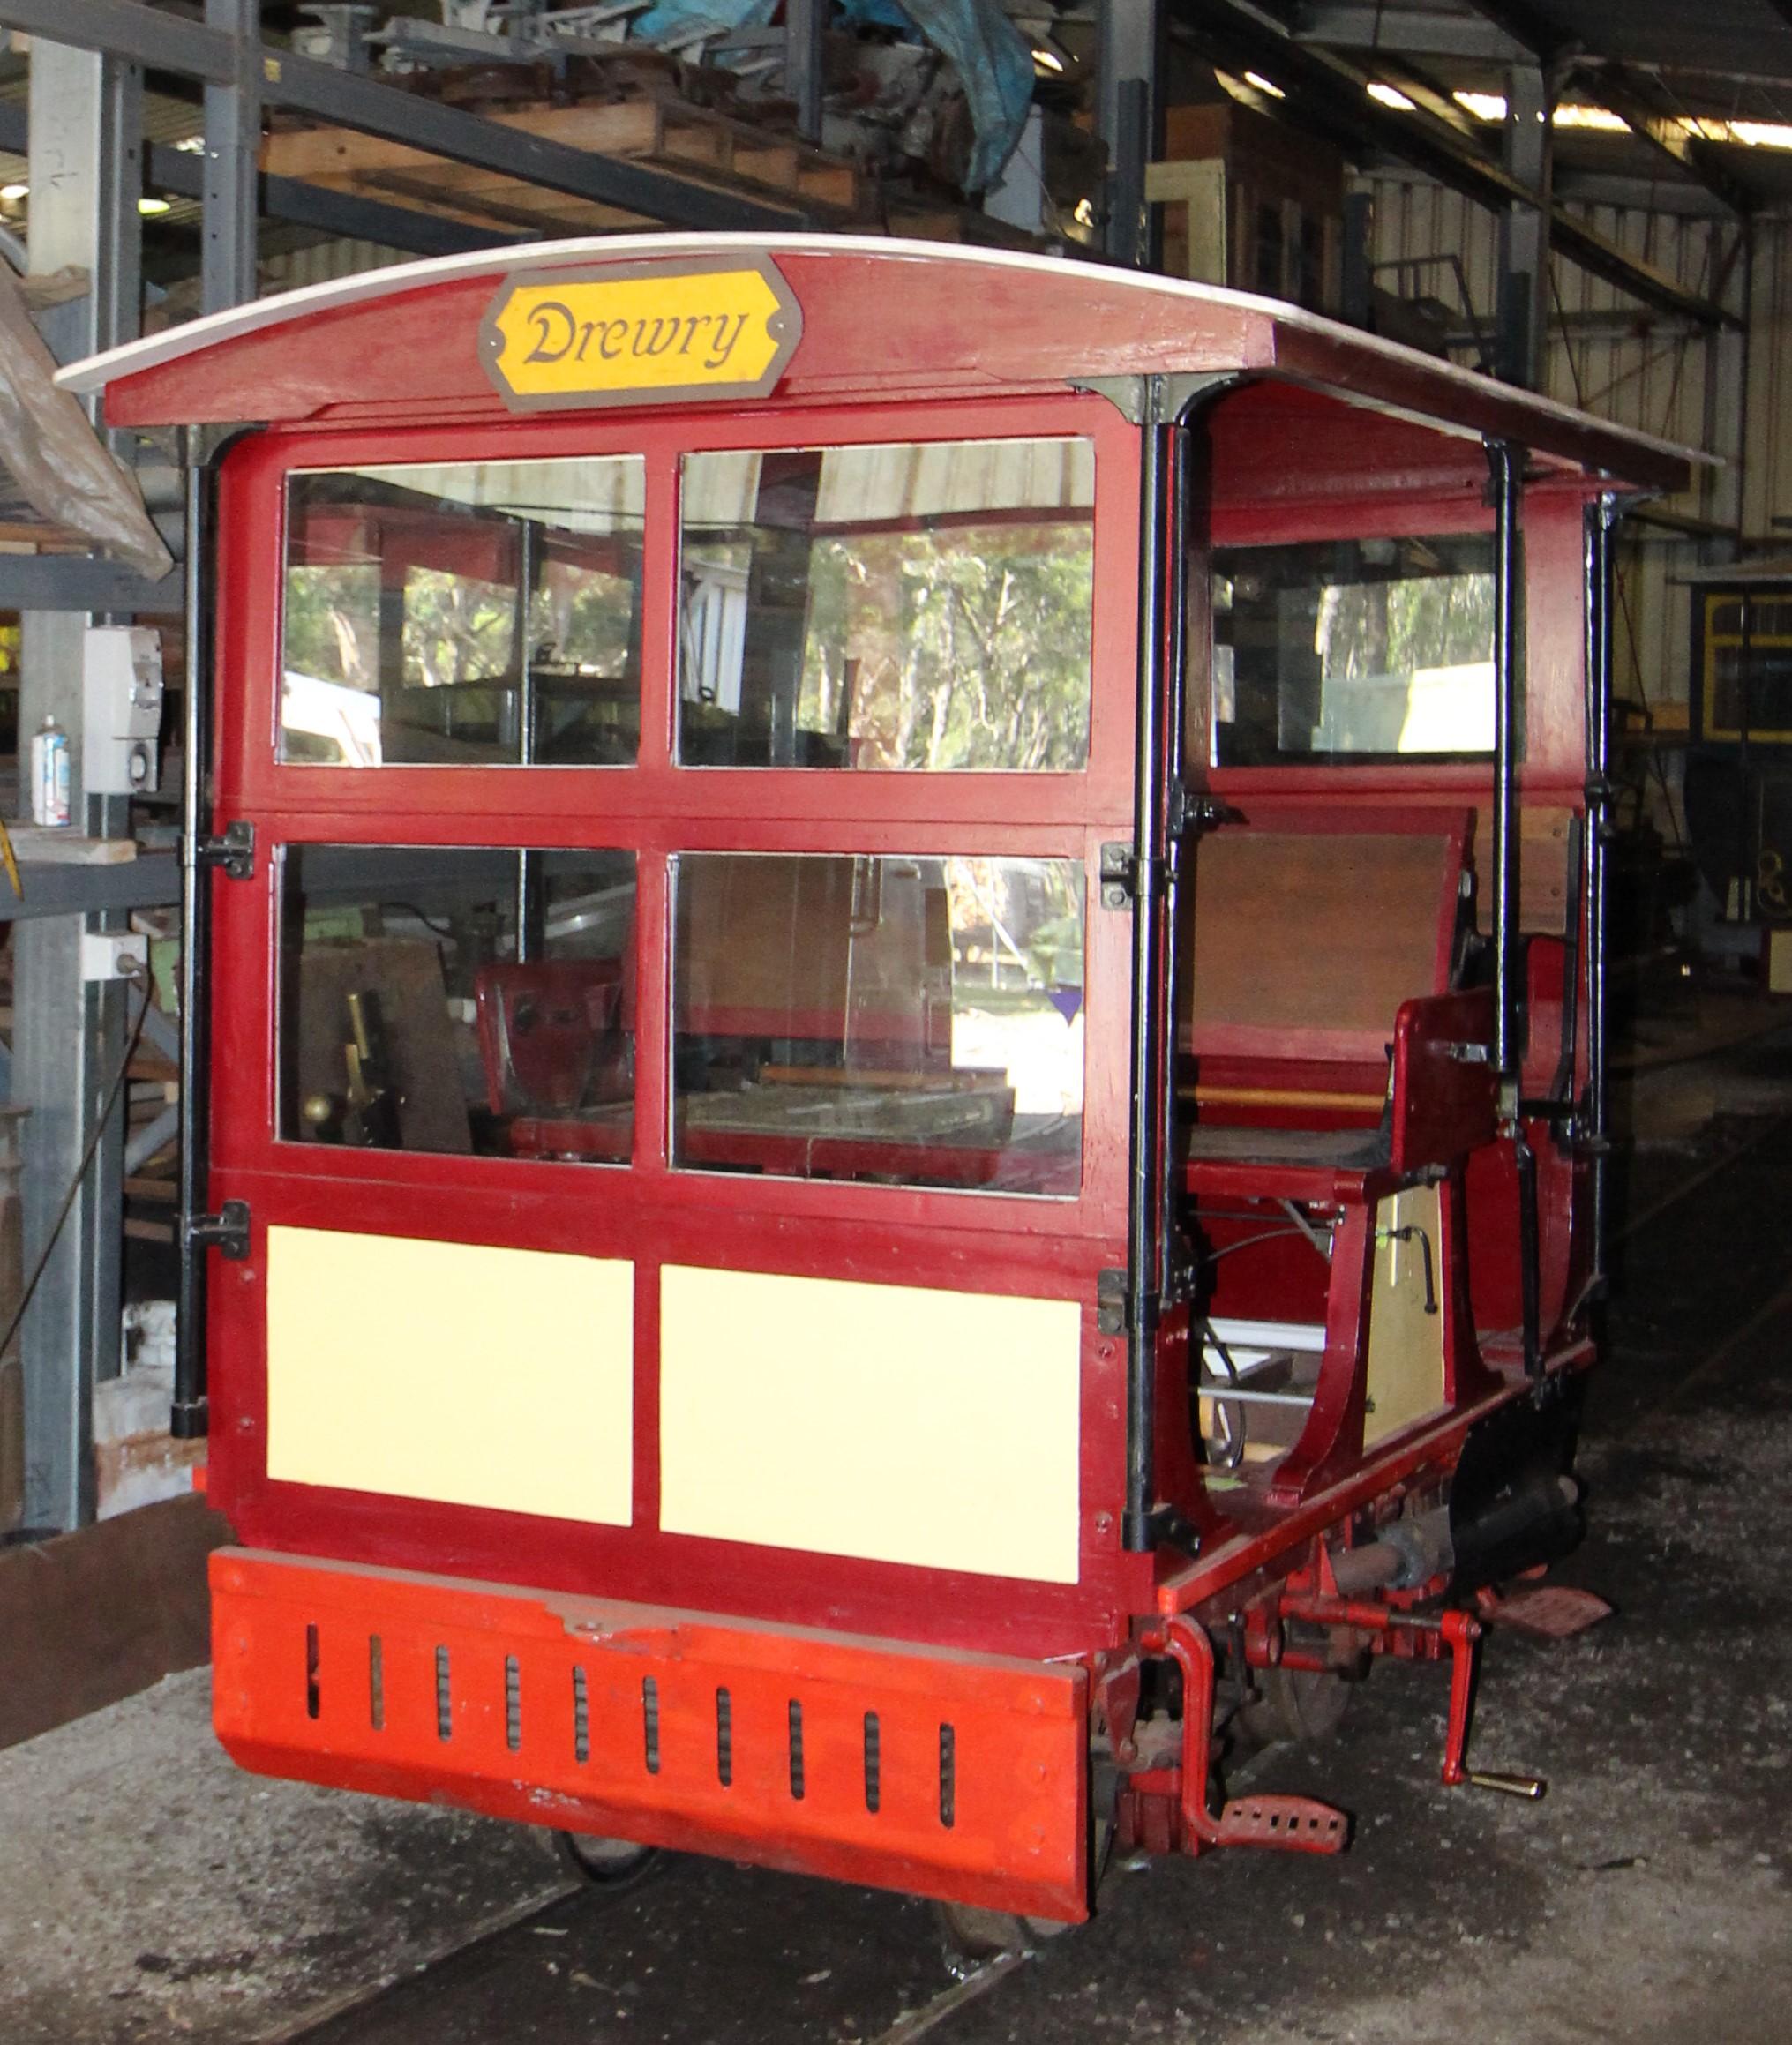 Drewry Cane Inspectors Car